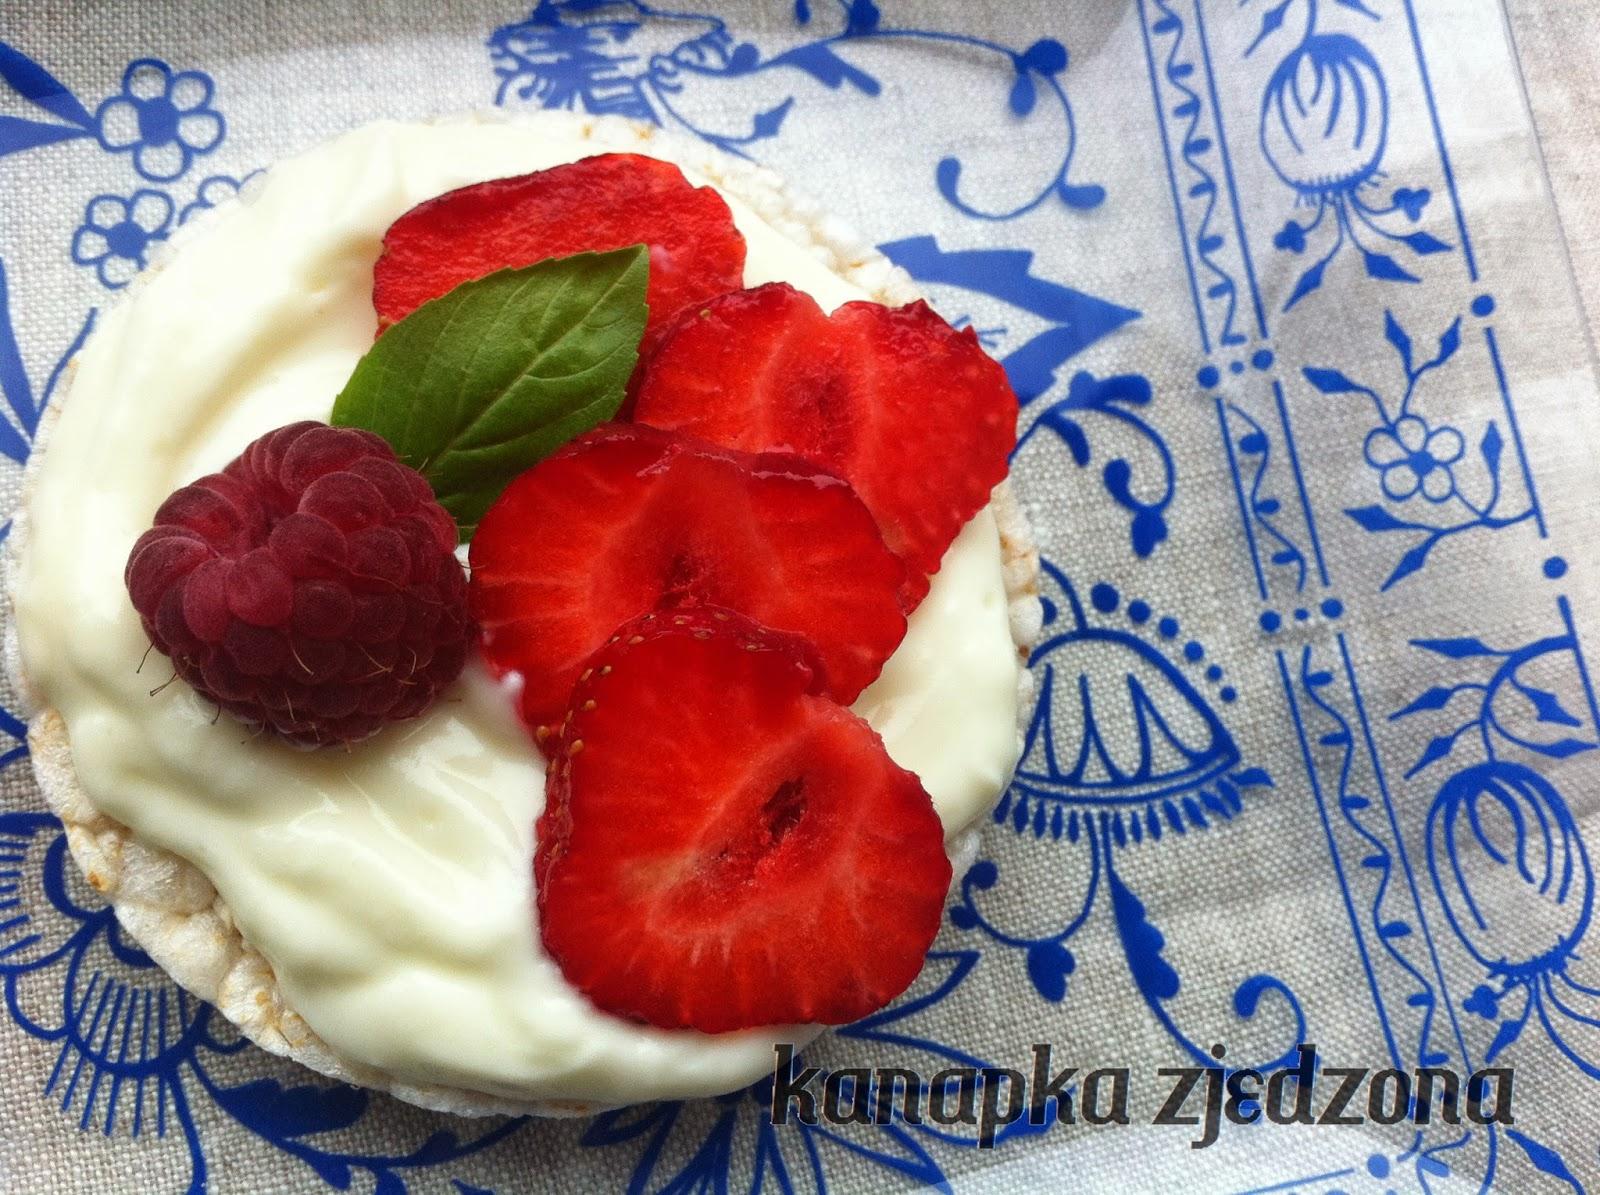 kanapka z truskawkami, sandwich with strawberries, Sandwich mit Erdbeeren,  sandwich avec fraises, sándwich con fresas